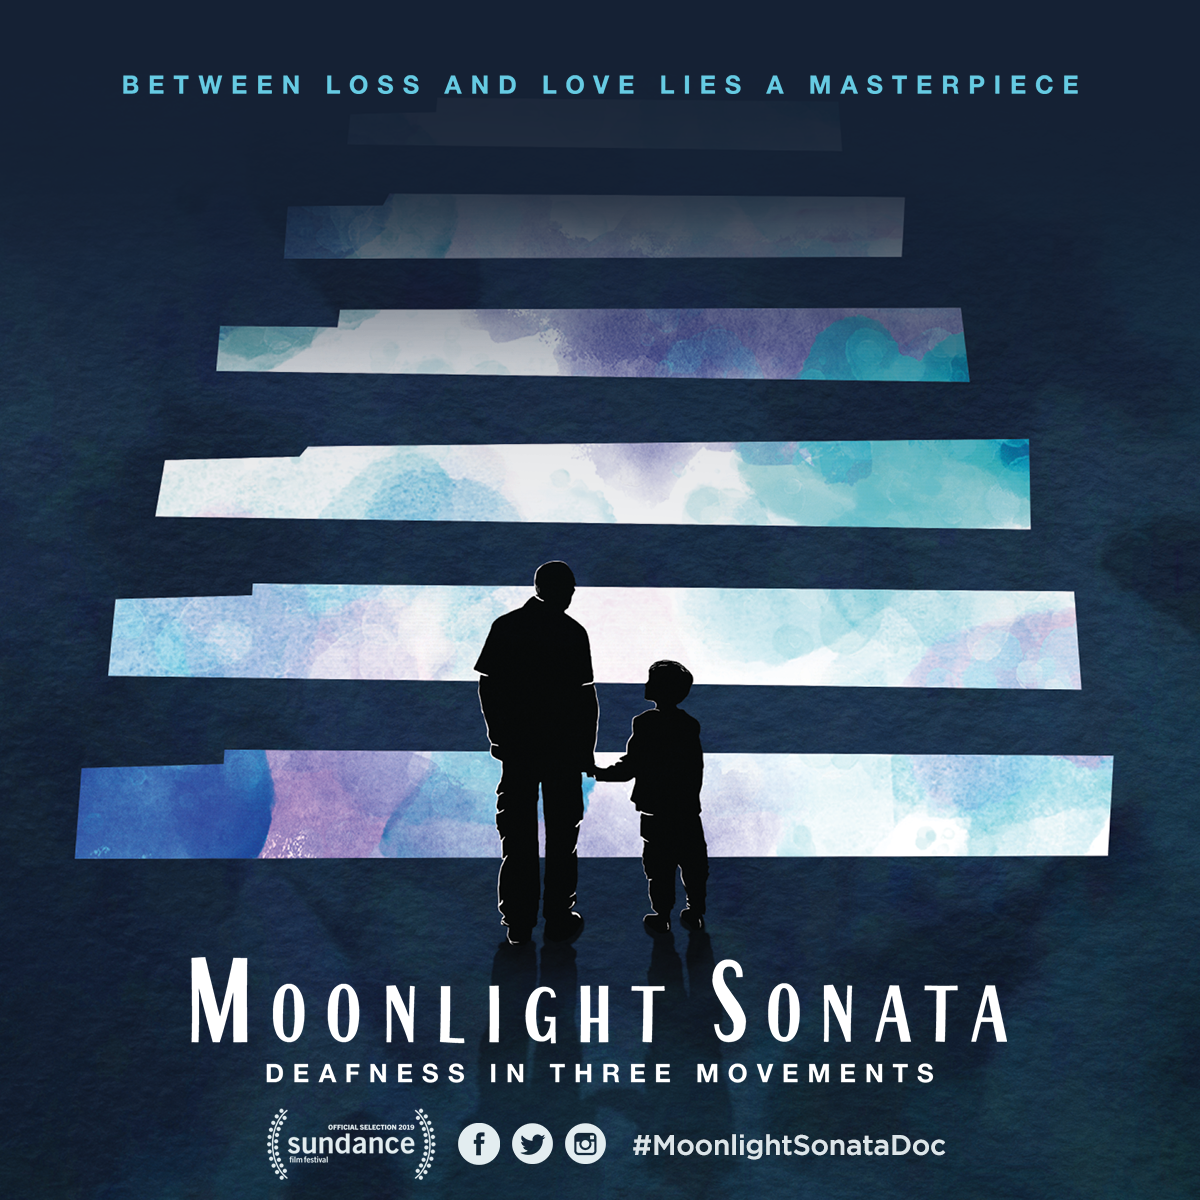 MoonlightSonata_1200x1200_1.png